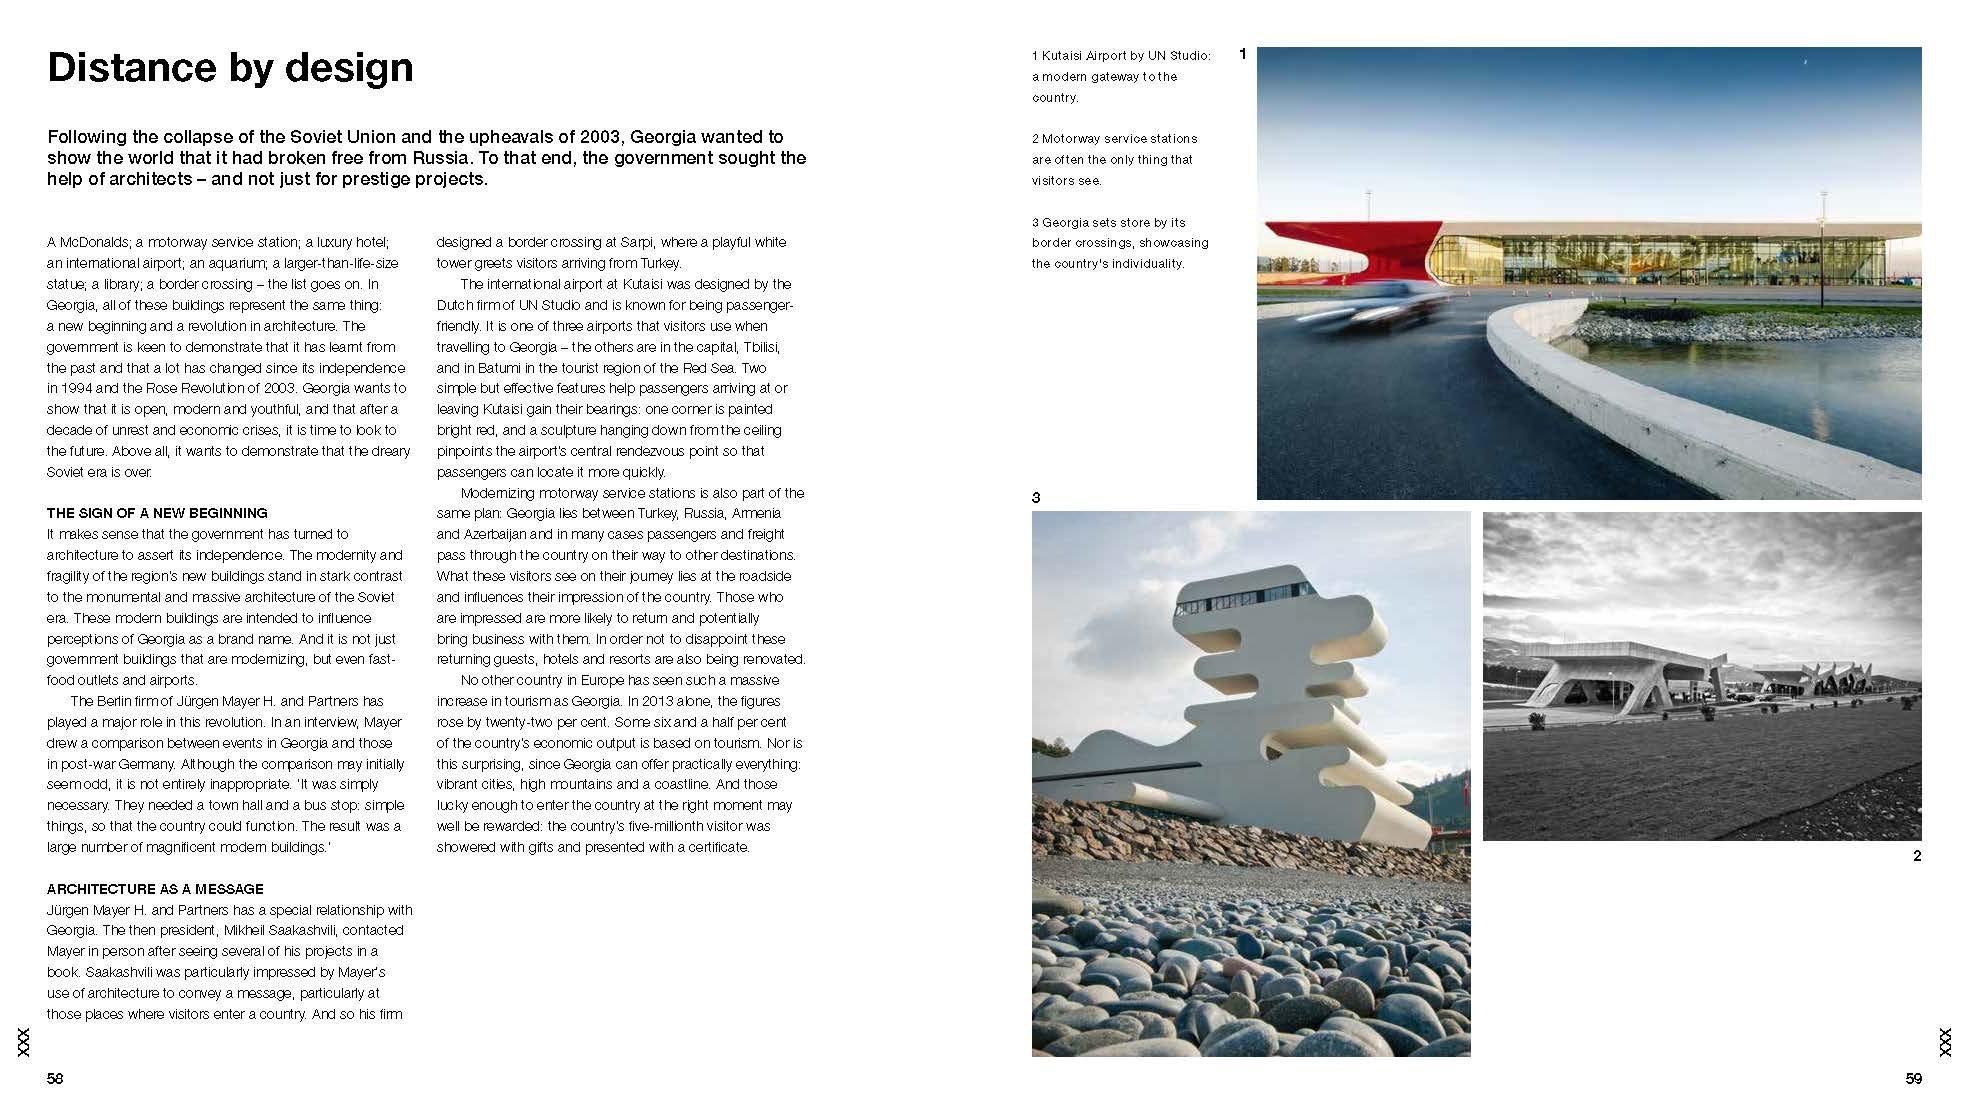 机场的艺术(The Art of the Airport) - wuwei1101 - 西花社